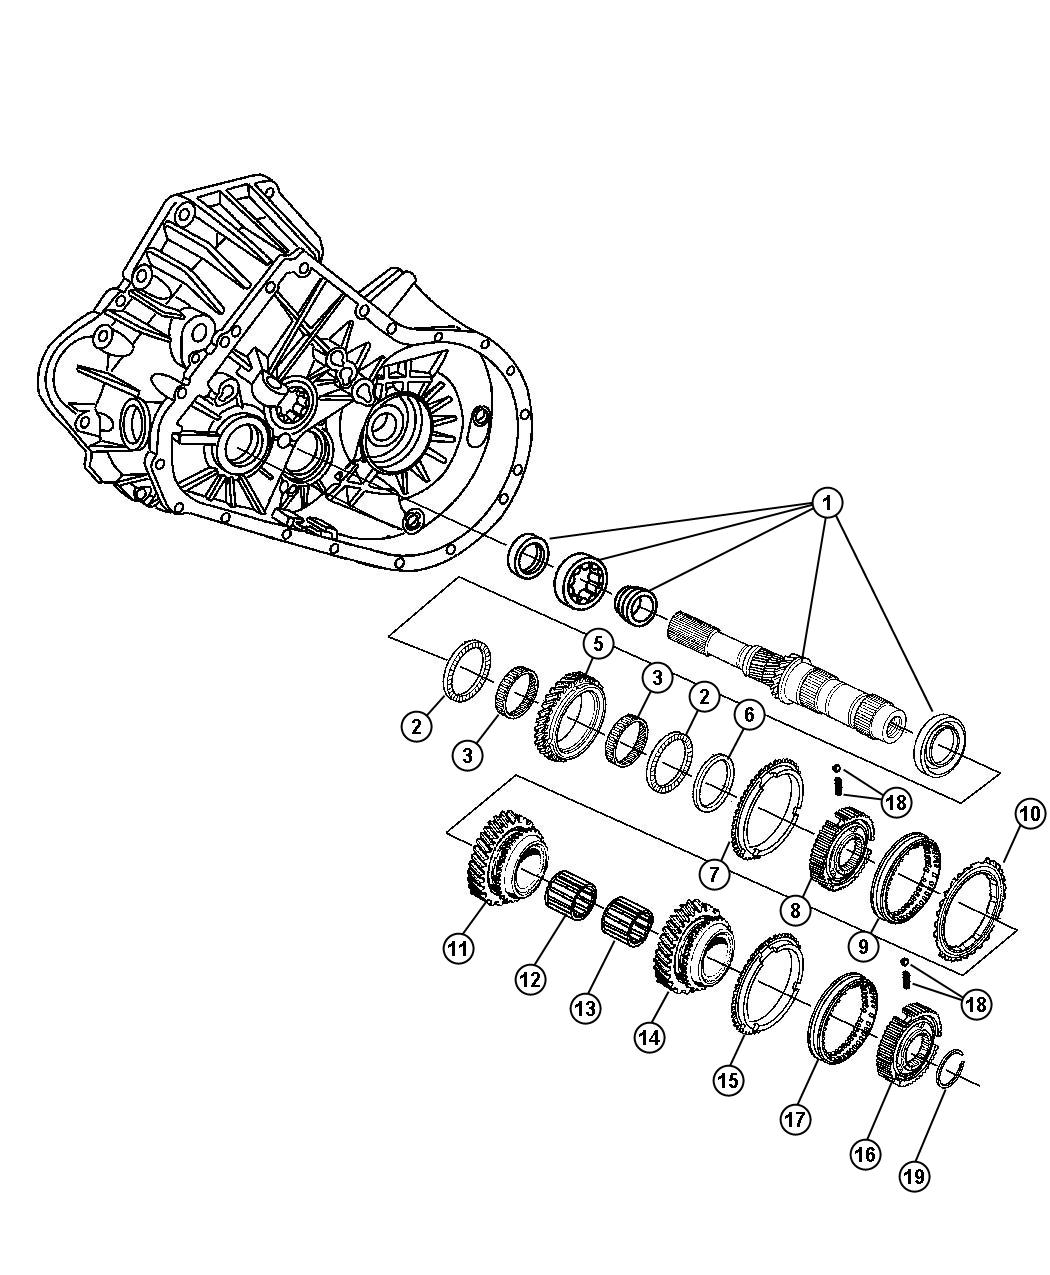 2008 Chrysler PT Cruiser Gear. Fourth. Shaft, input